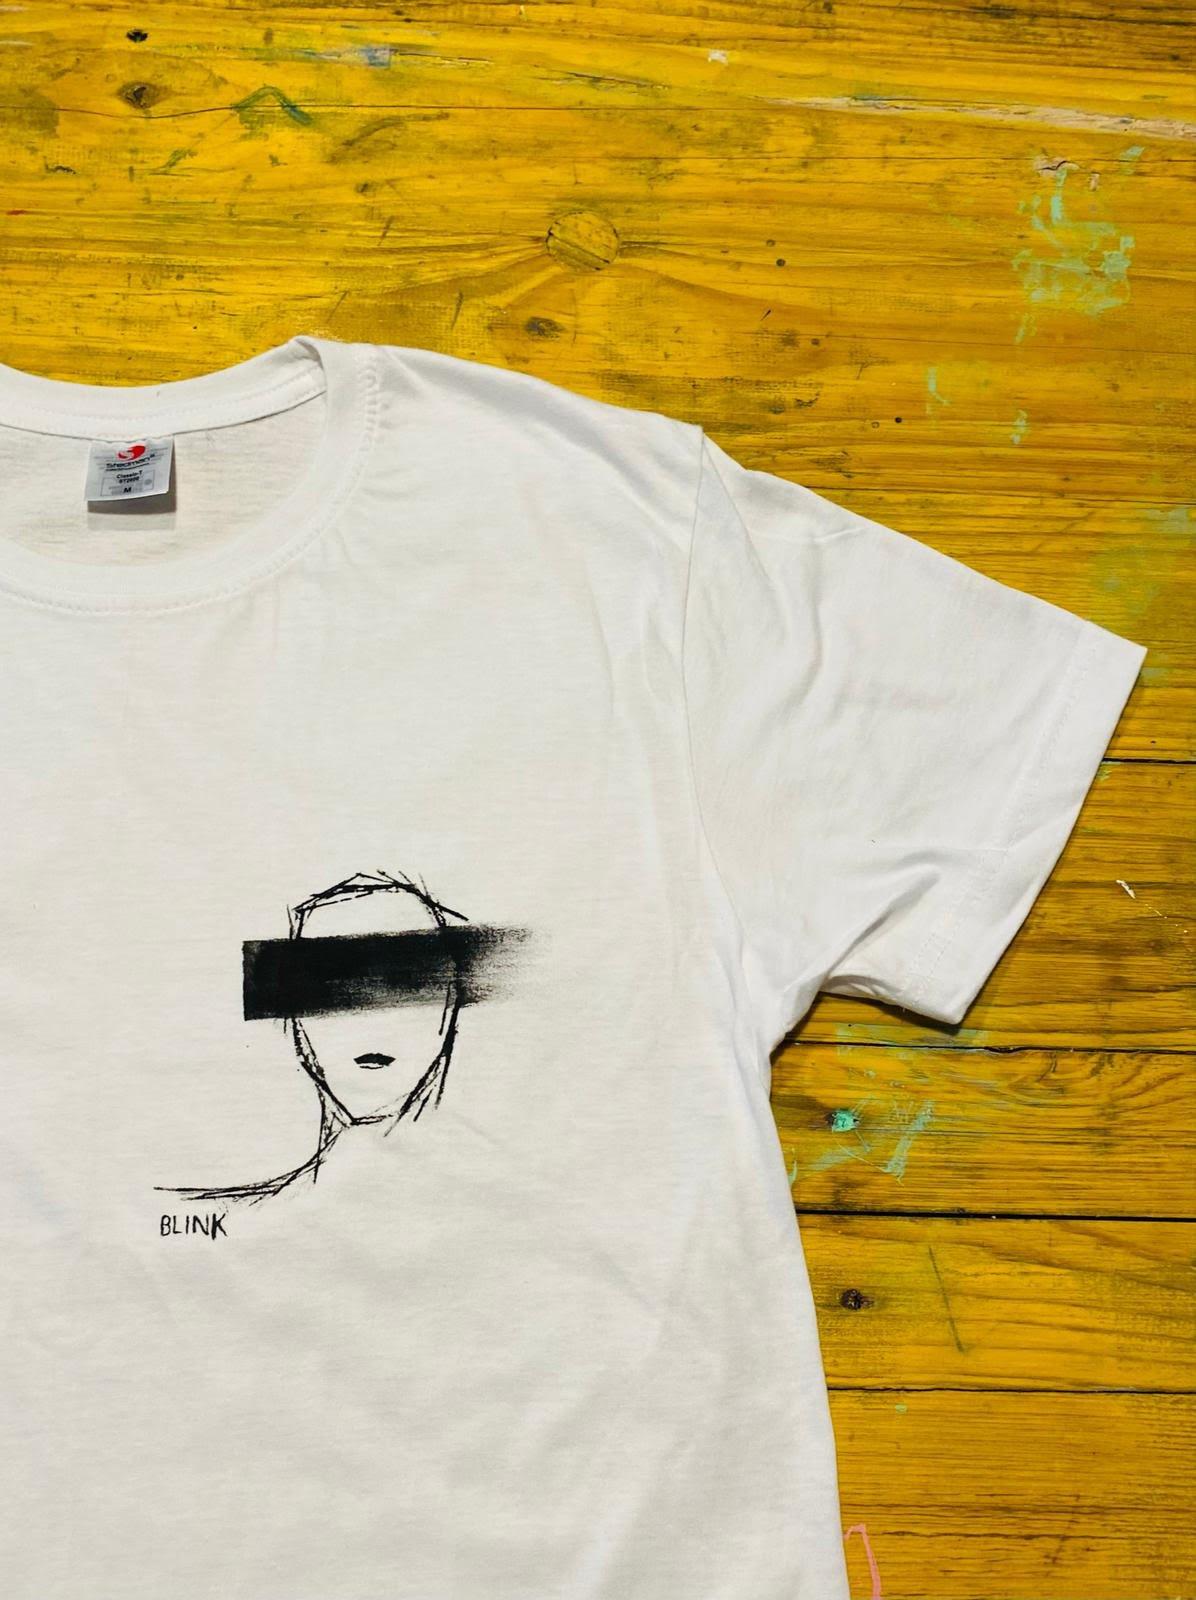 Image of BLink shirt di Tita e Eco Dario